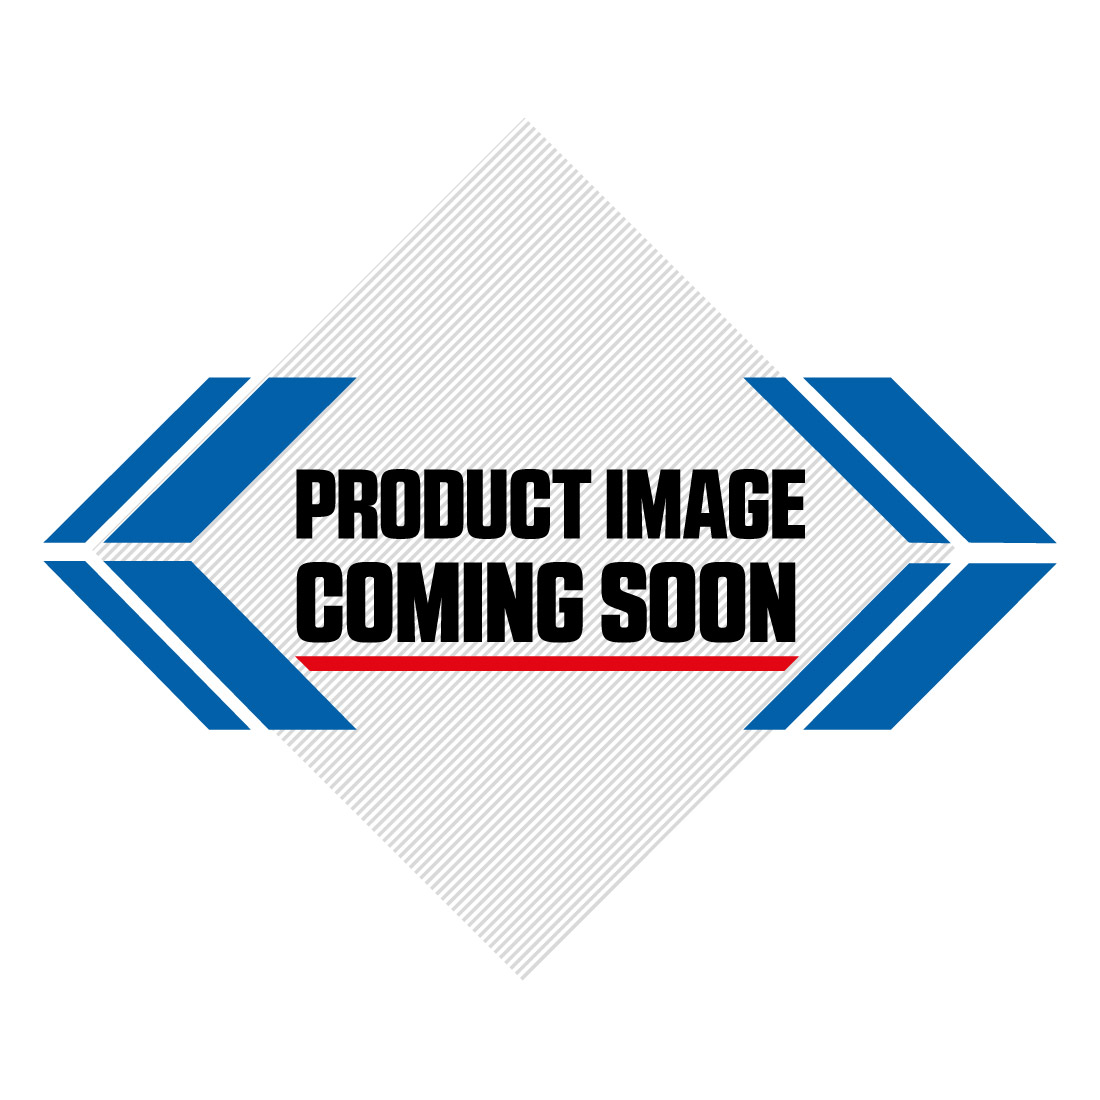 Kawasaki Restyled Plastic Kit KX 85 (01-09) (11-12) OEM Factory Image-1